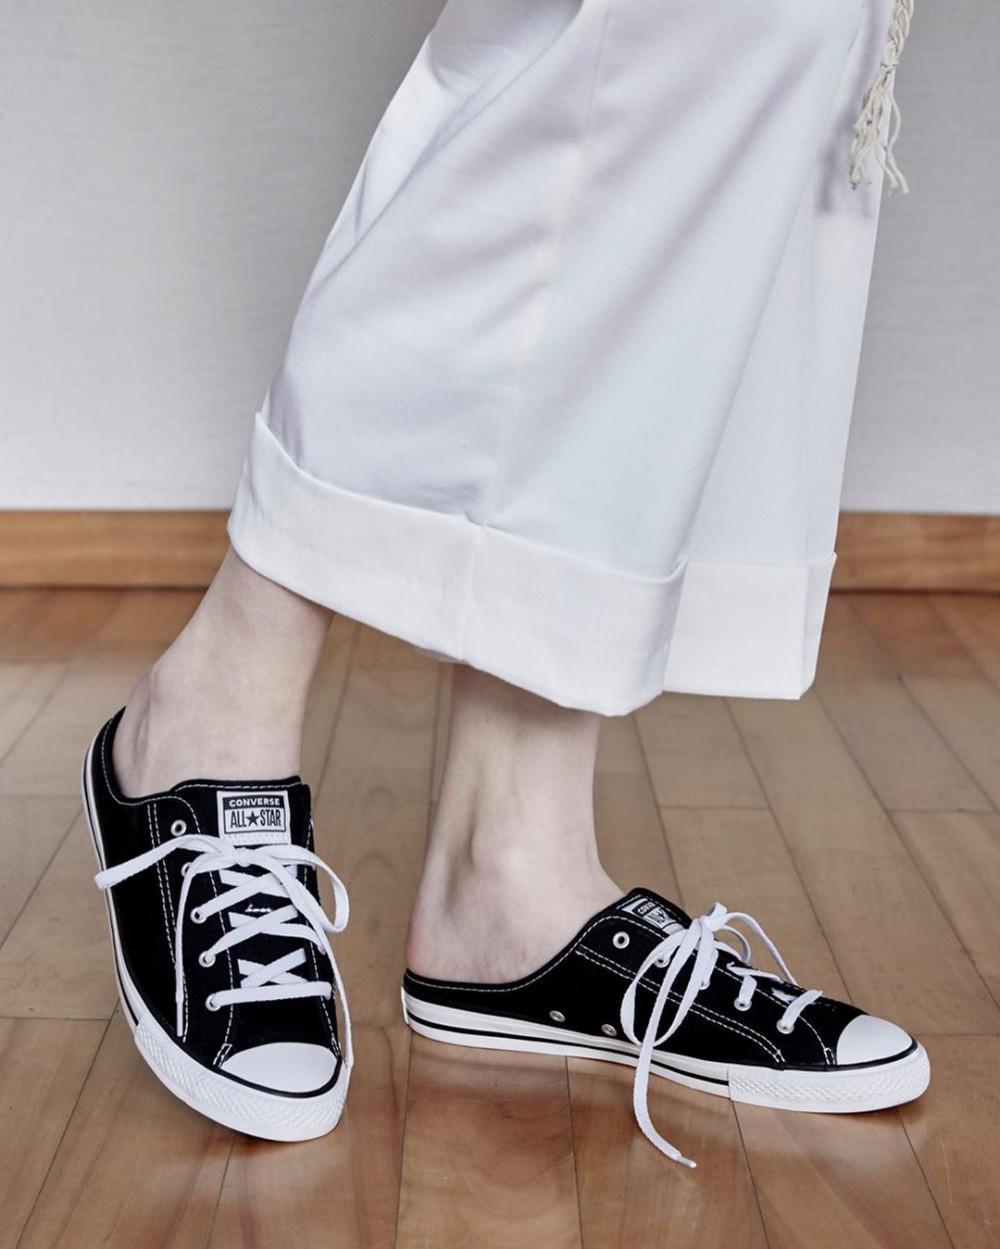 Converse的 Chuck Taylor 懶人 Mule Shoes 拖鞋